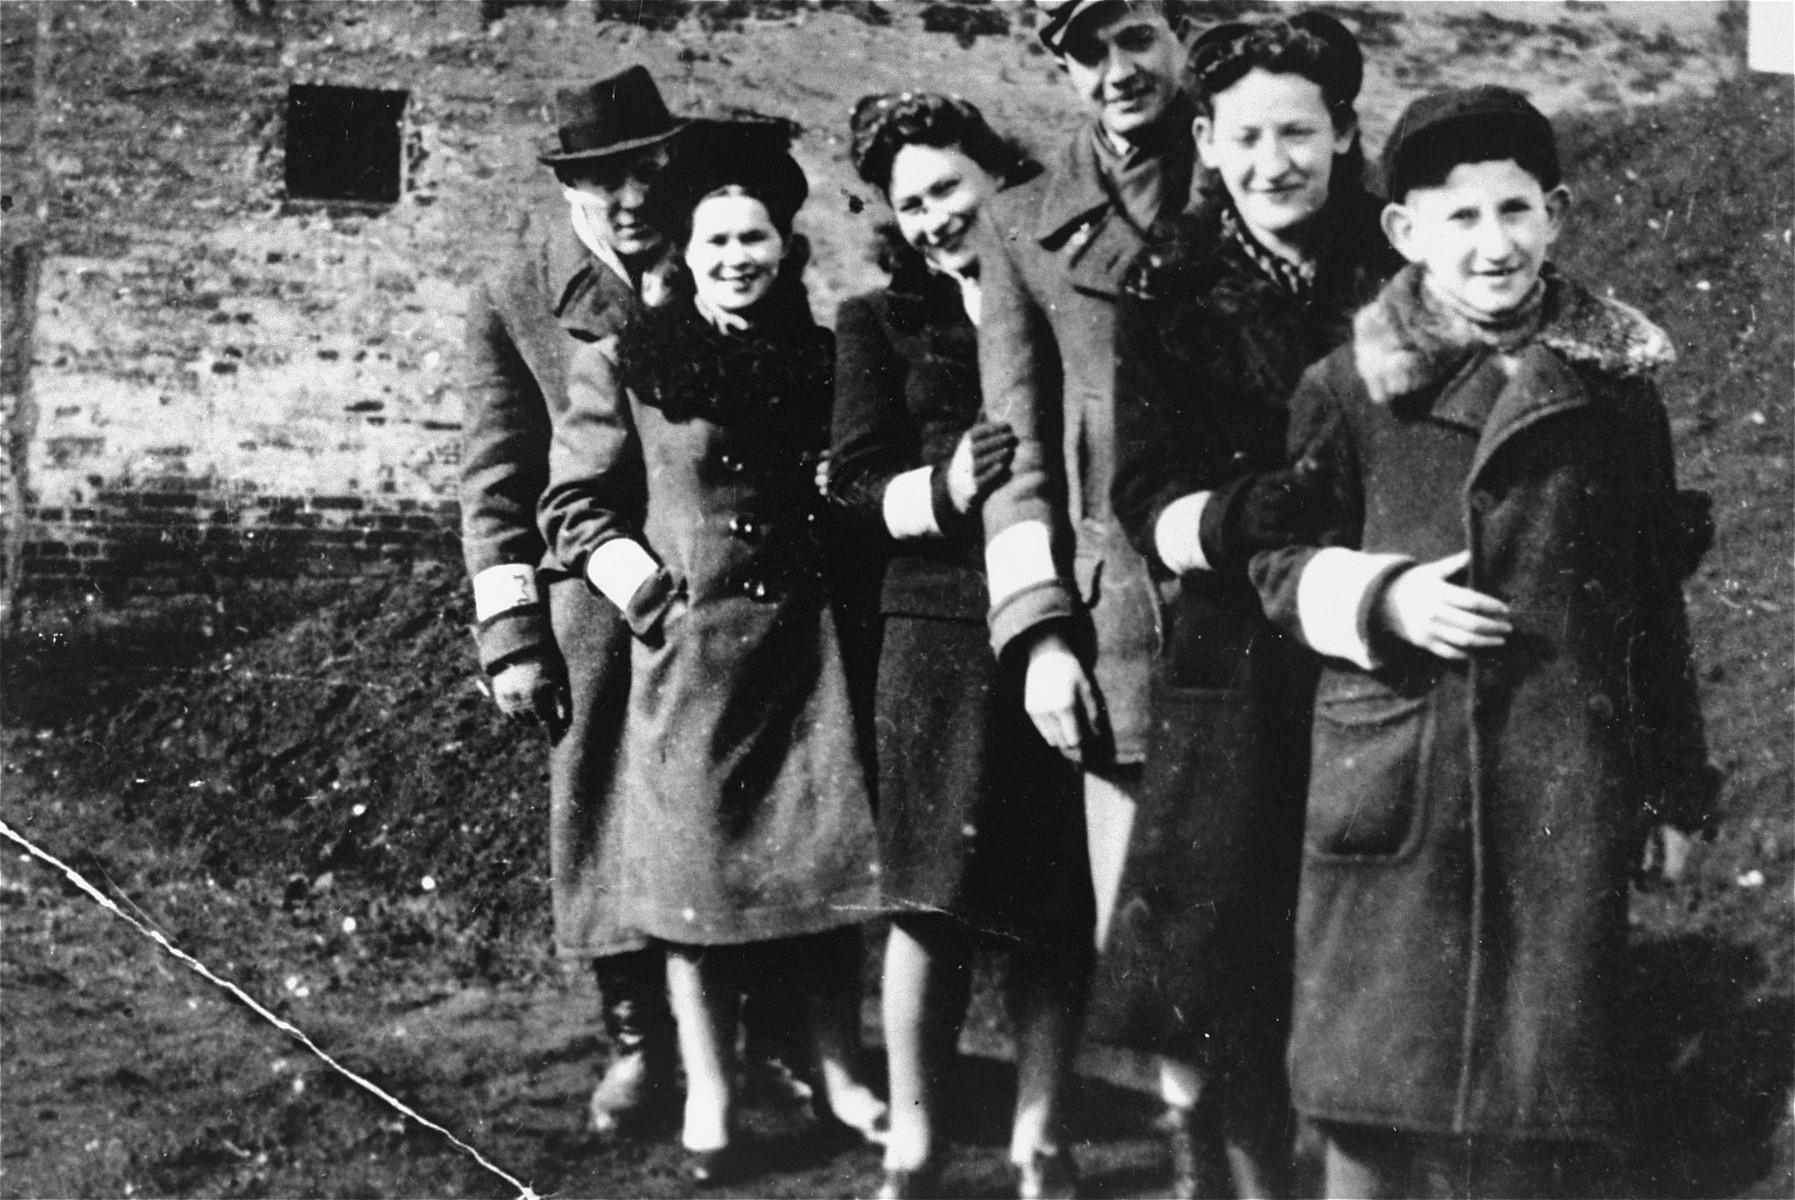 Group portrait of six young Jewish men and women in the Piotrkow Trybunalski ghetto.  Pictured from left to right are: Abram Zarnowiecki, Rozia Zarnowiecki, Mania Freiberger, Moniek, Rachel Zarnowiecki, and Chaim Zarnowiecki.  All perished during the war.